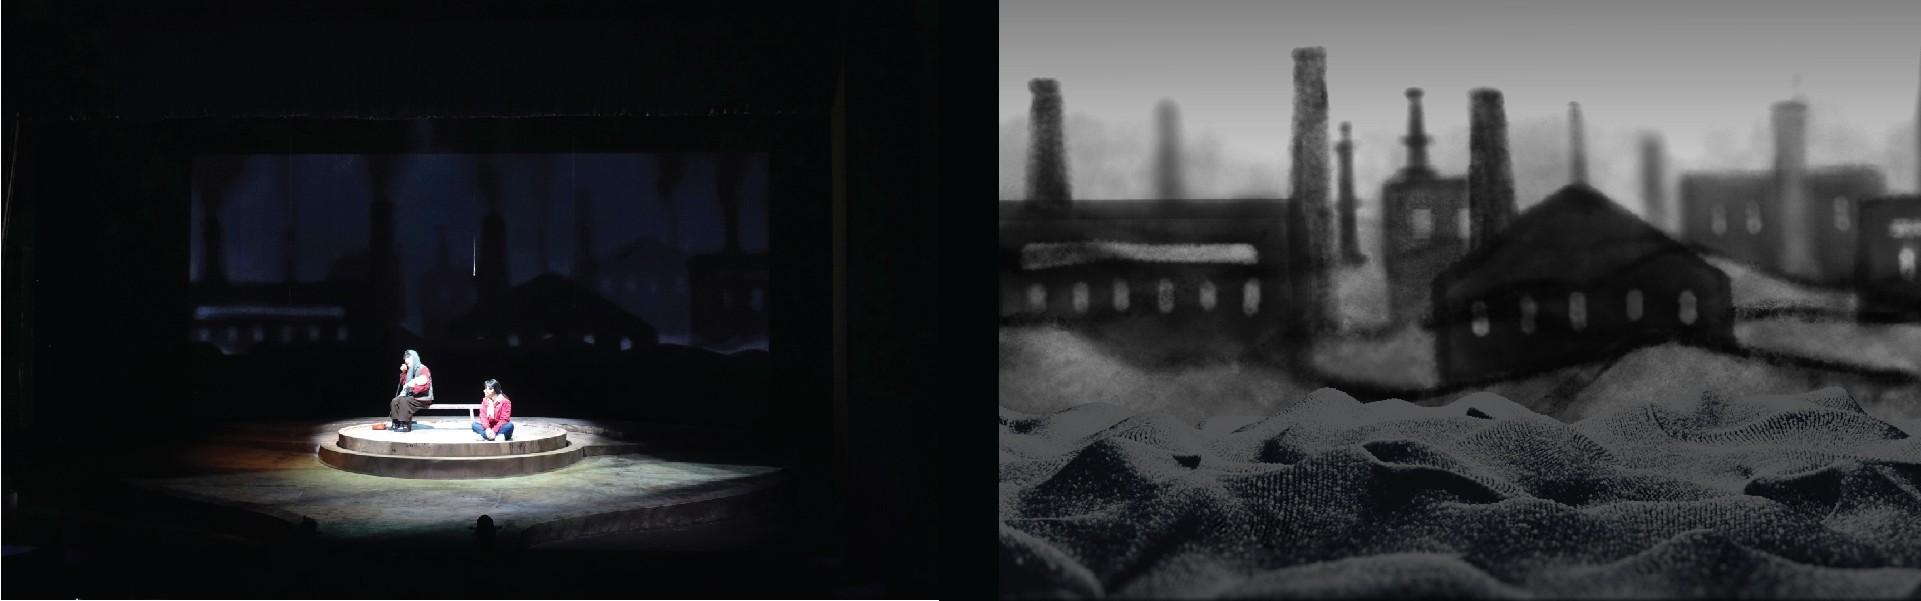 Untitled-1-11